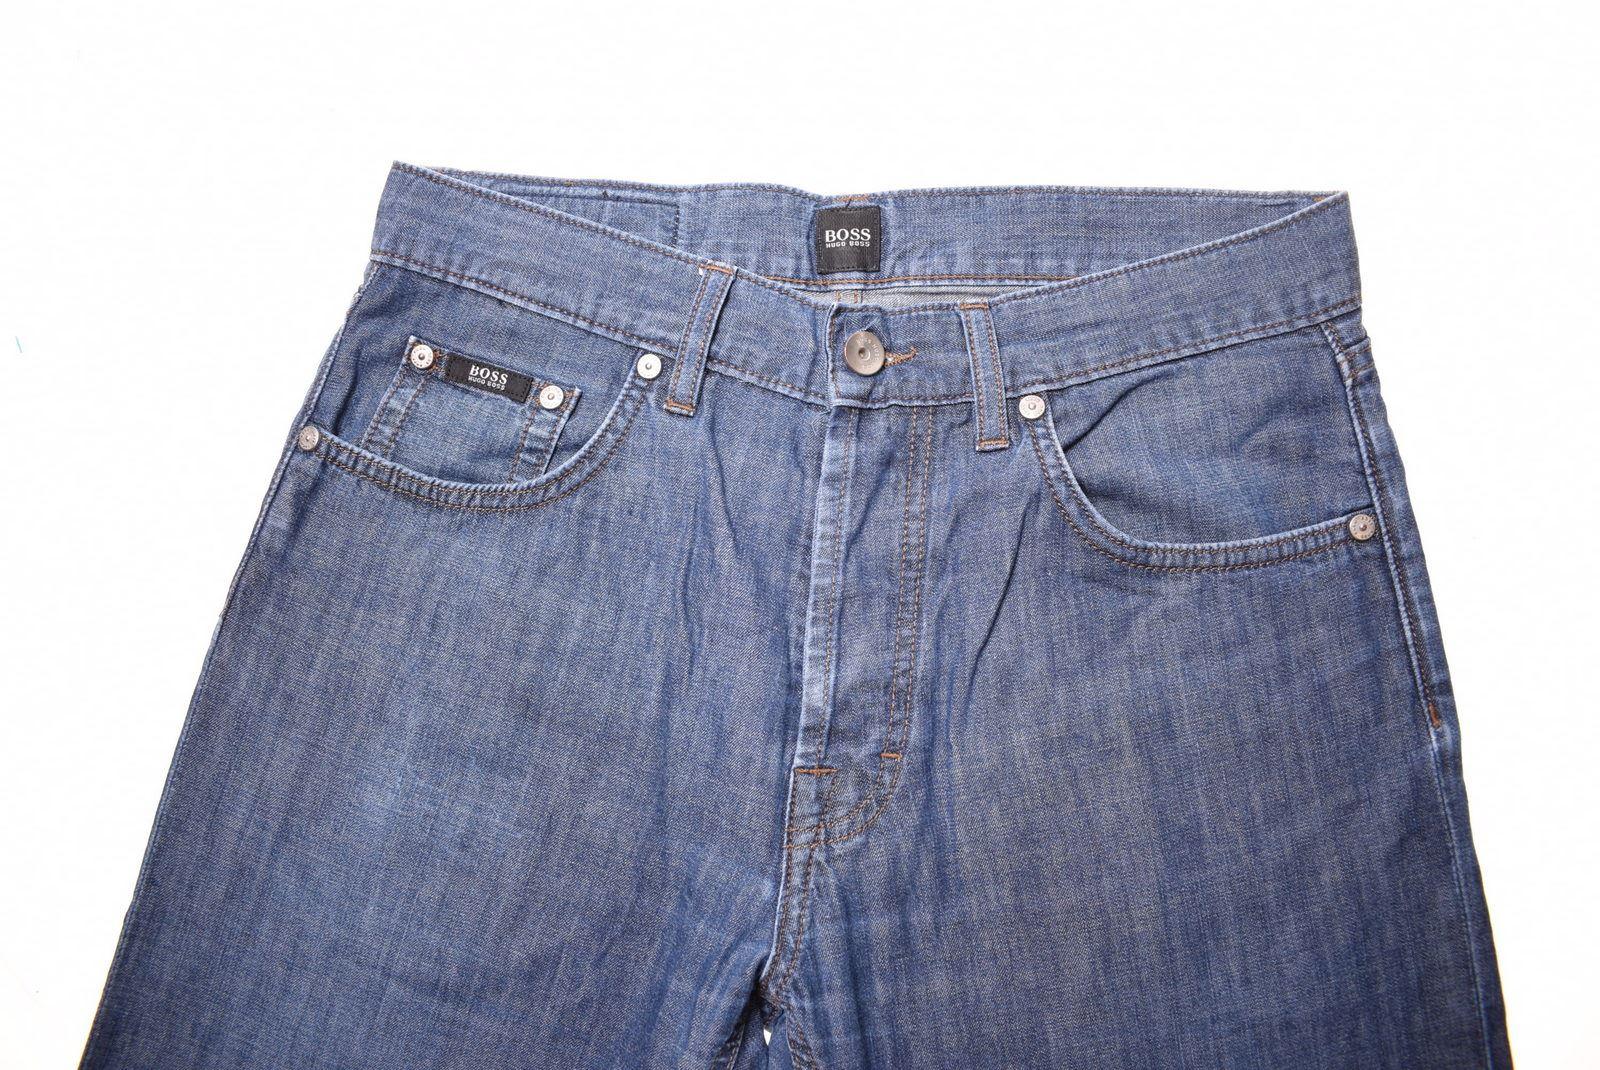 1e09db97 HUGO BOSS Mens Jeans W30 L29 Blue Cotton Straight BW05 | eBay